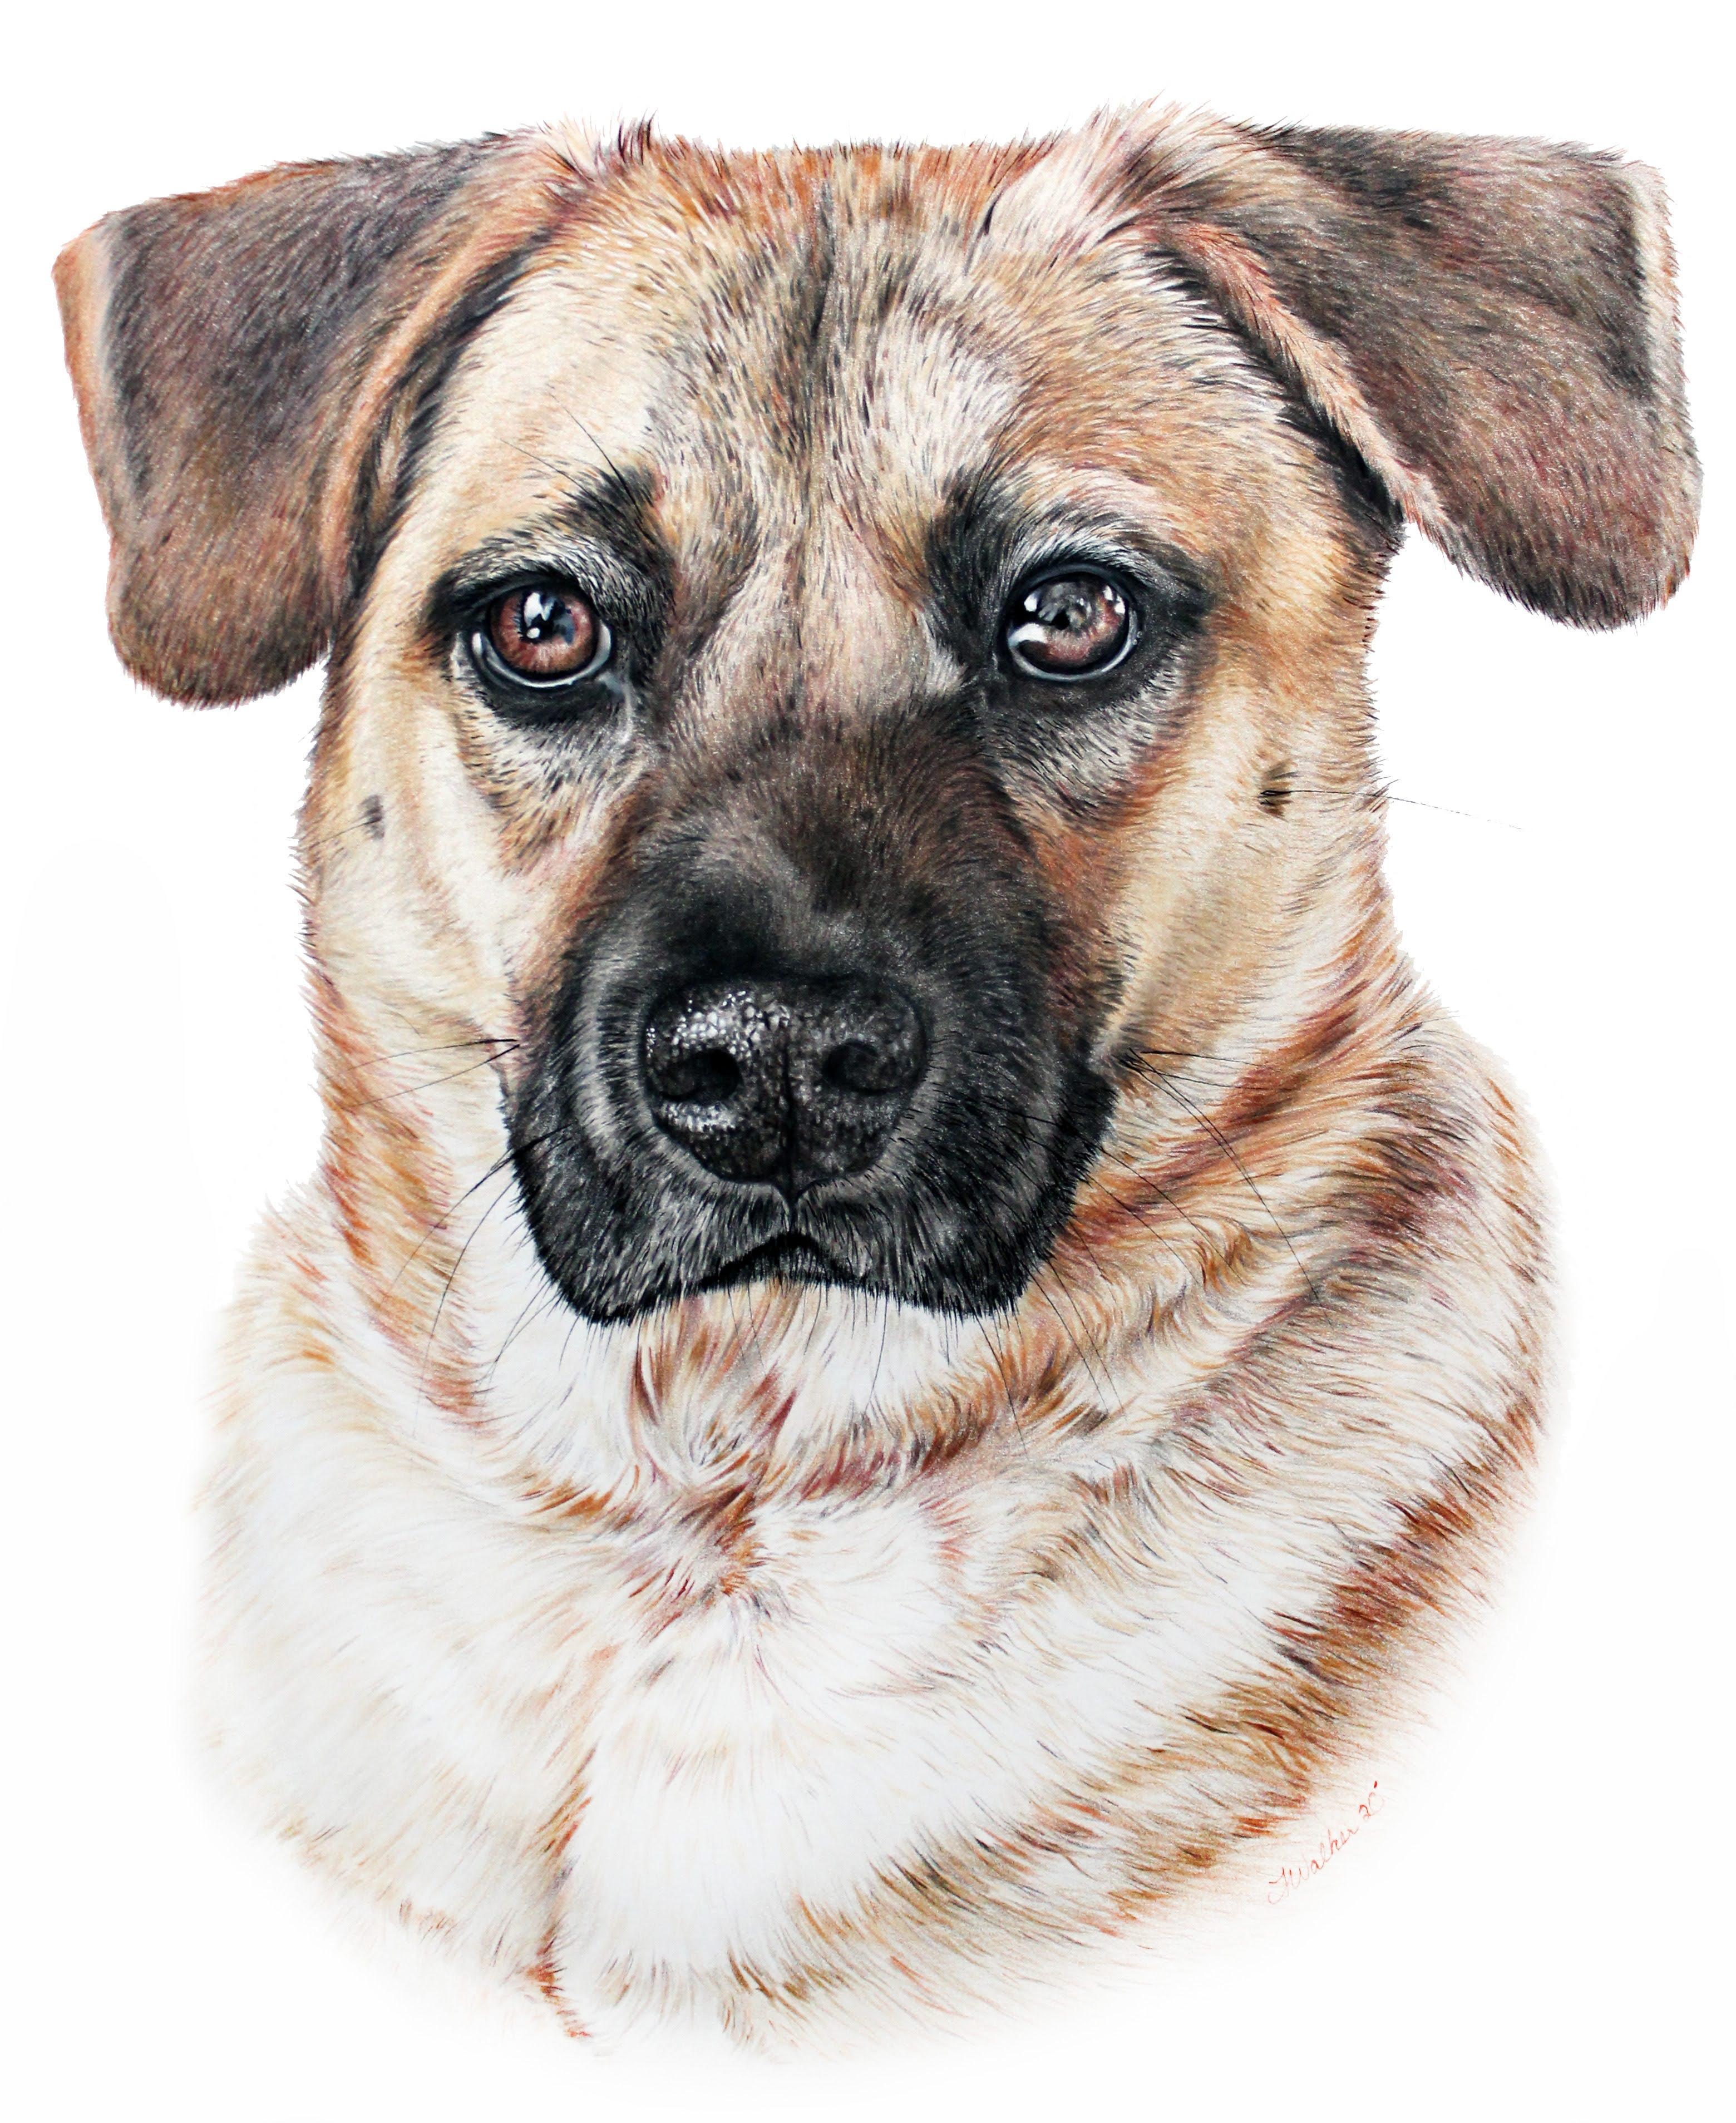 Hyperrealistic Pet Portrait of a Shepherd Mix Dog, Classically Hand Drawn Pet Portrait by TayloredIl